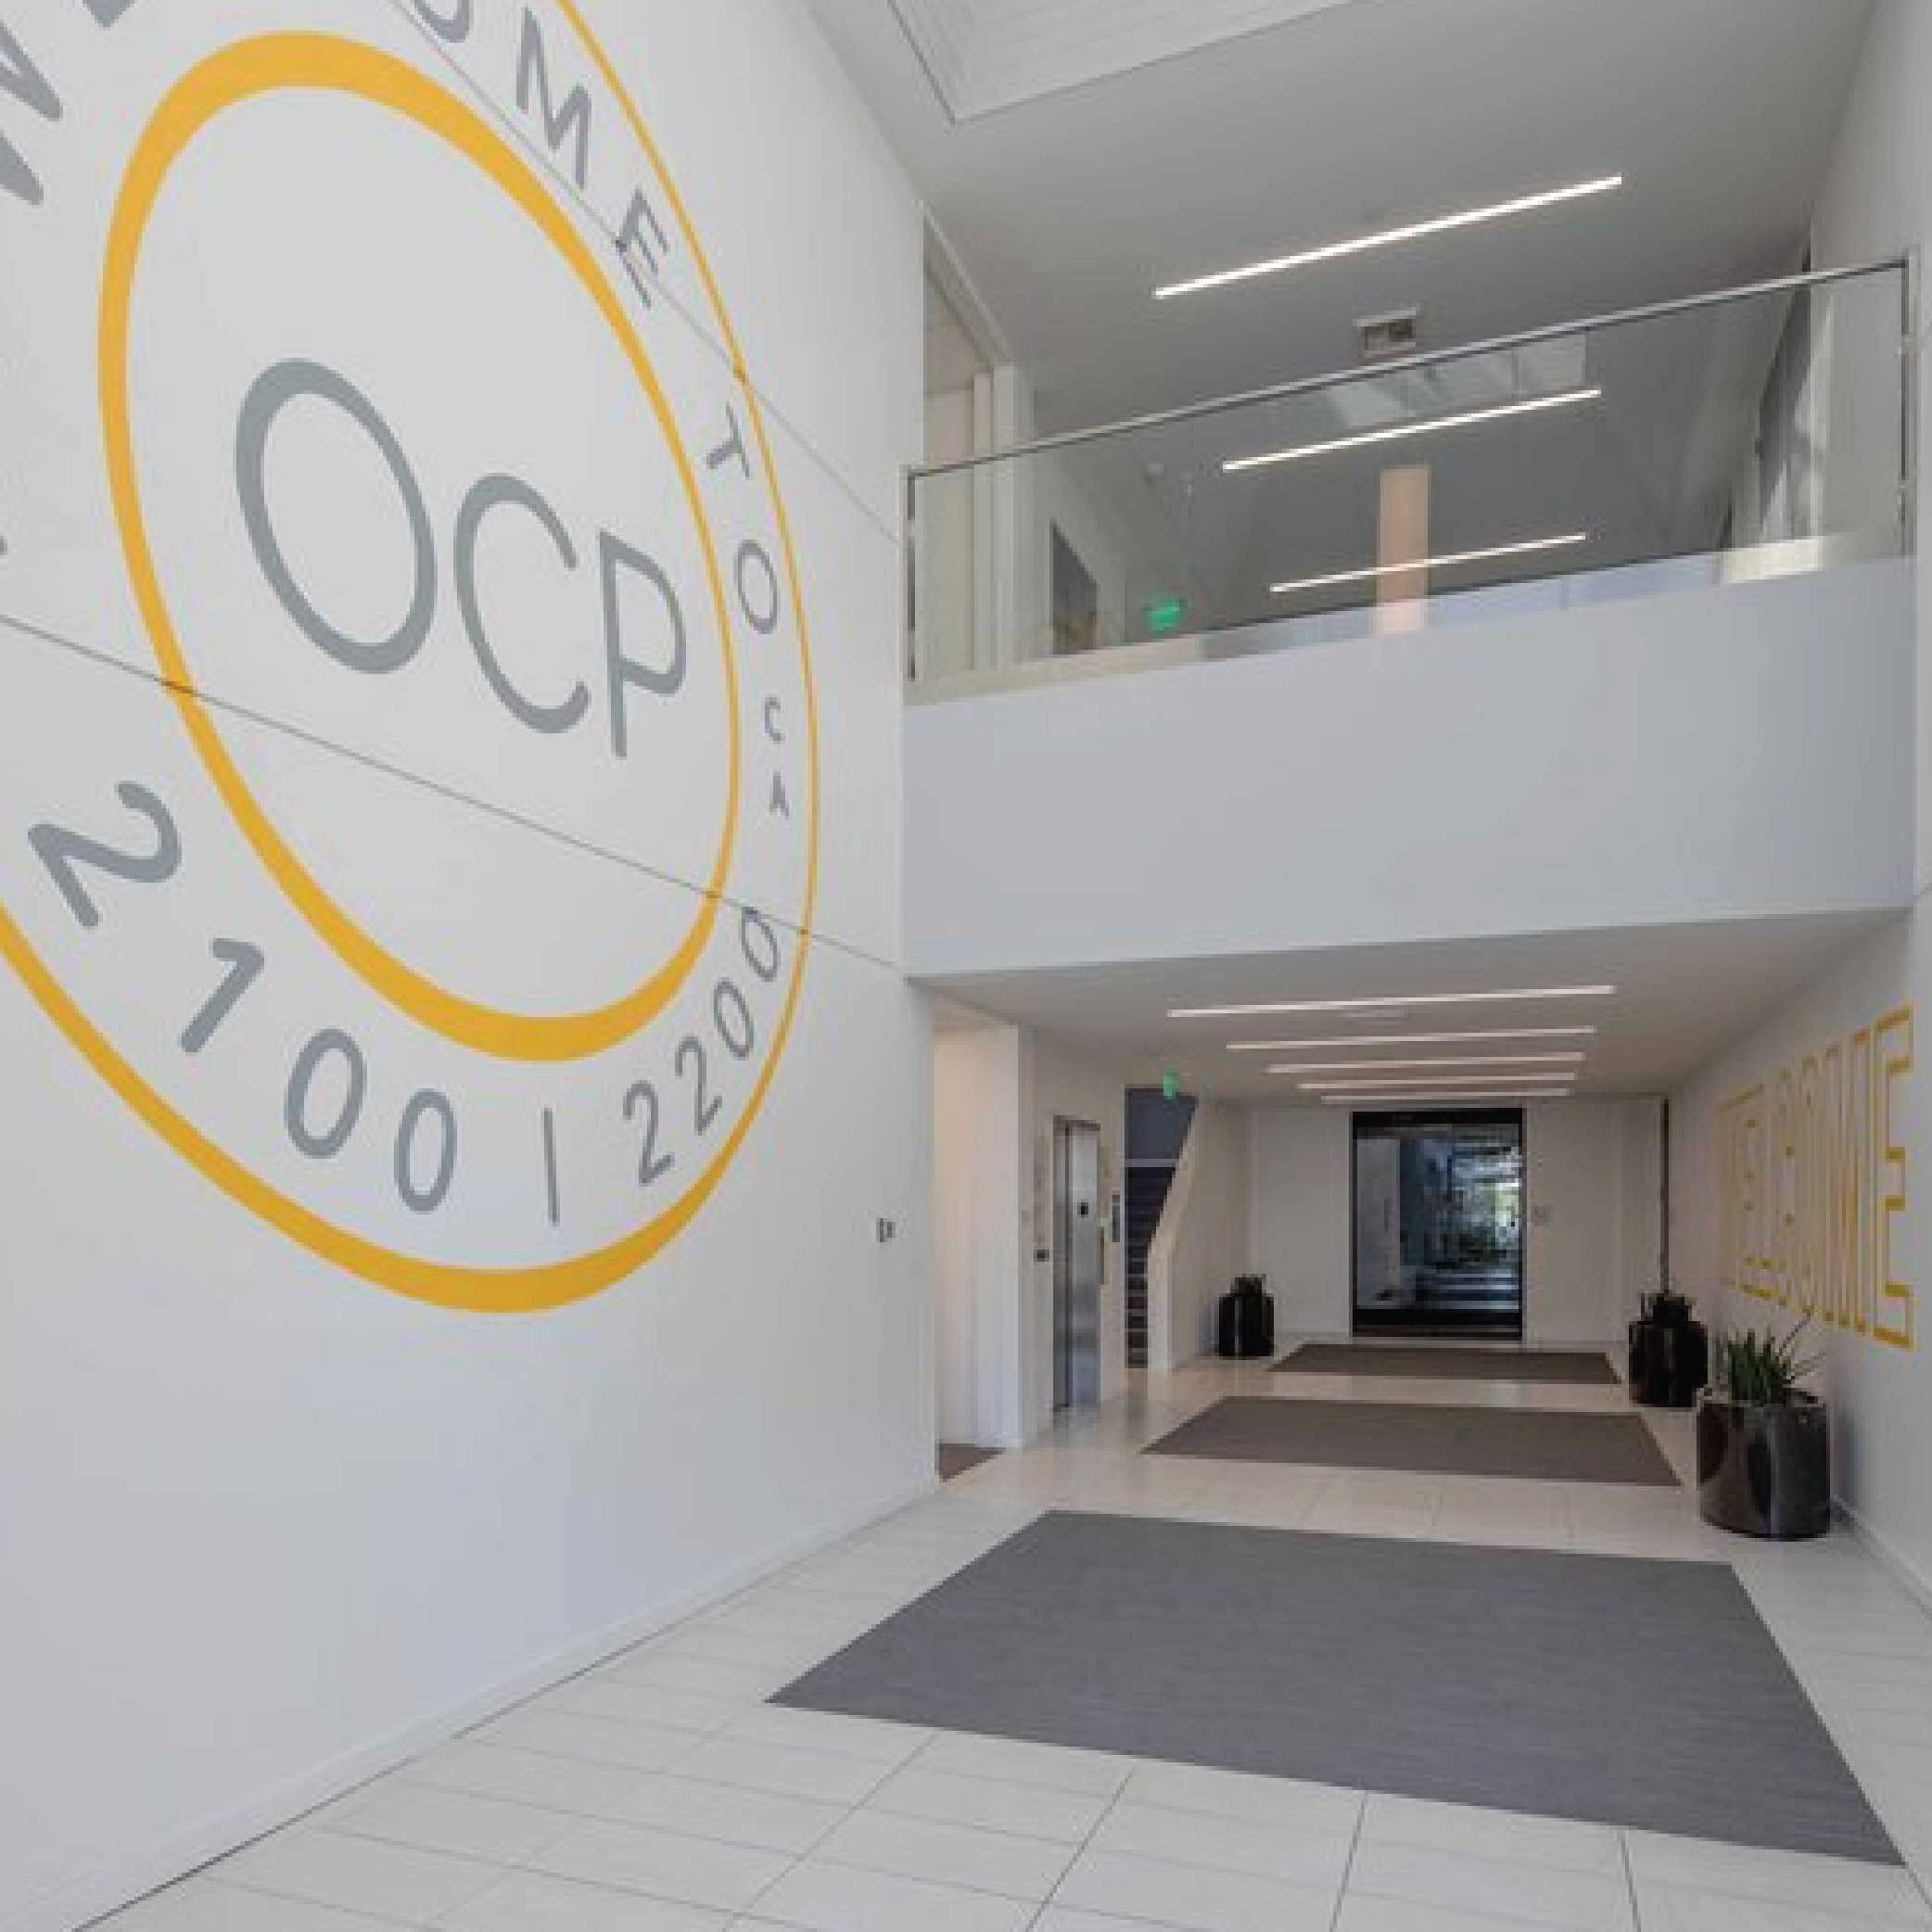 OCP - ORANGE, CA